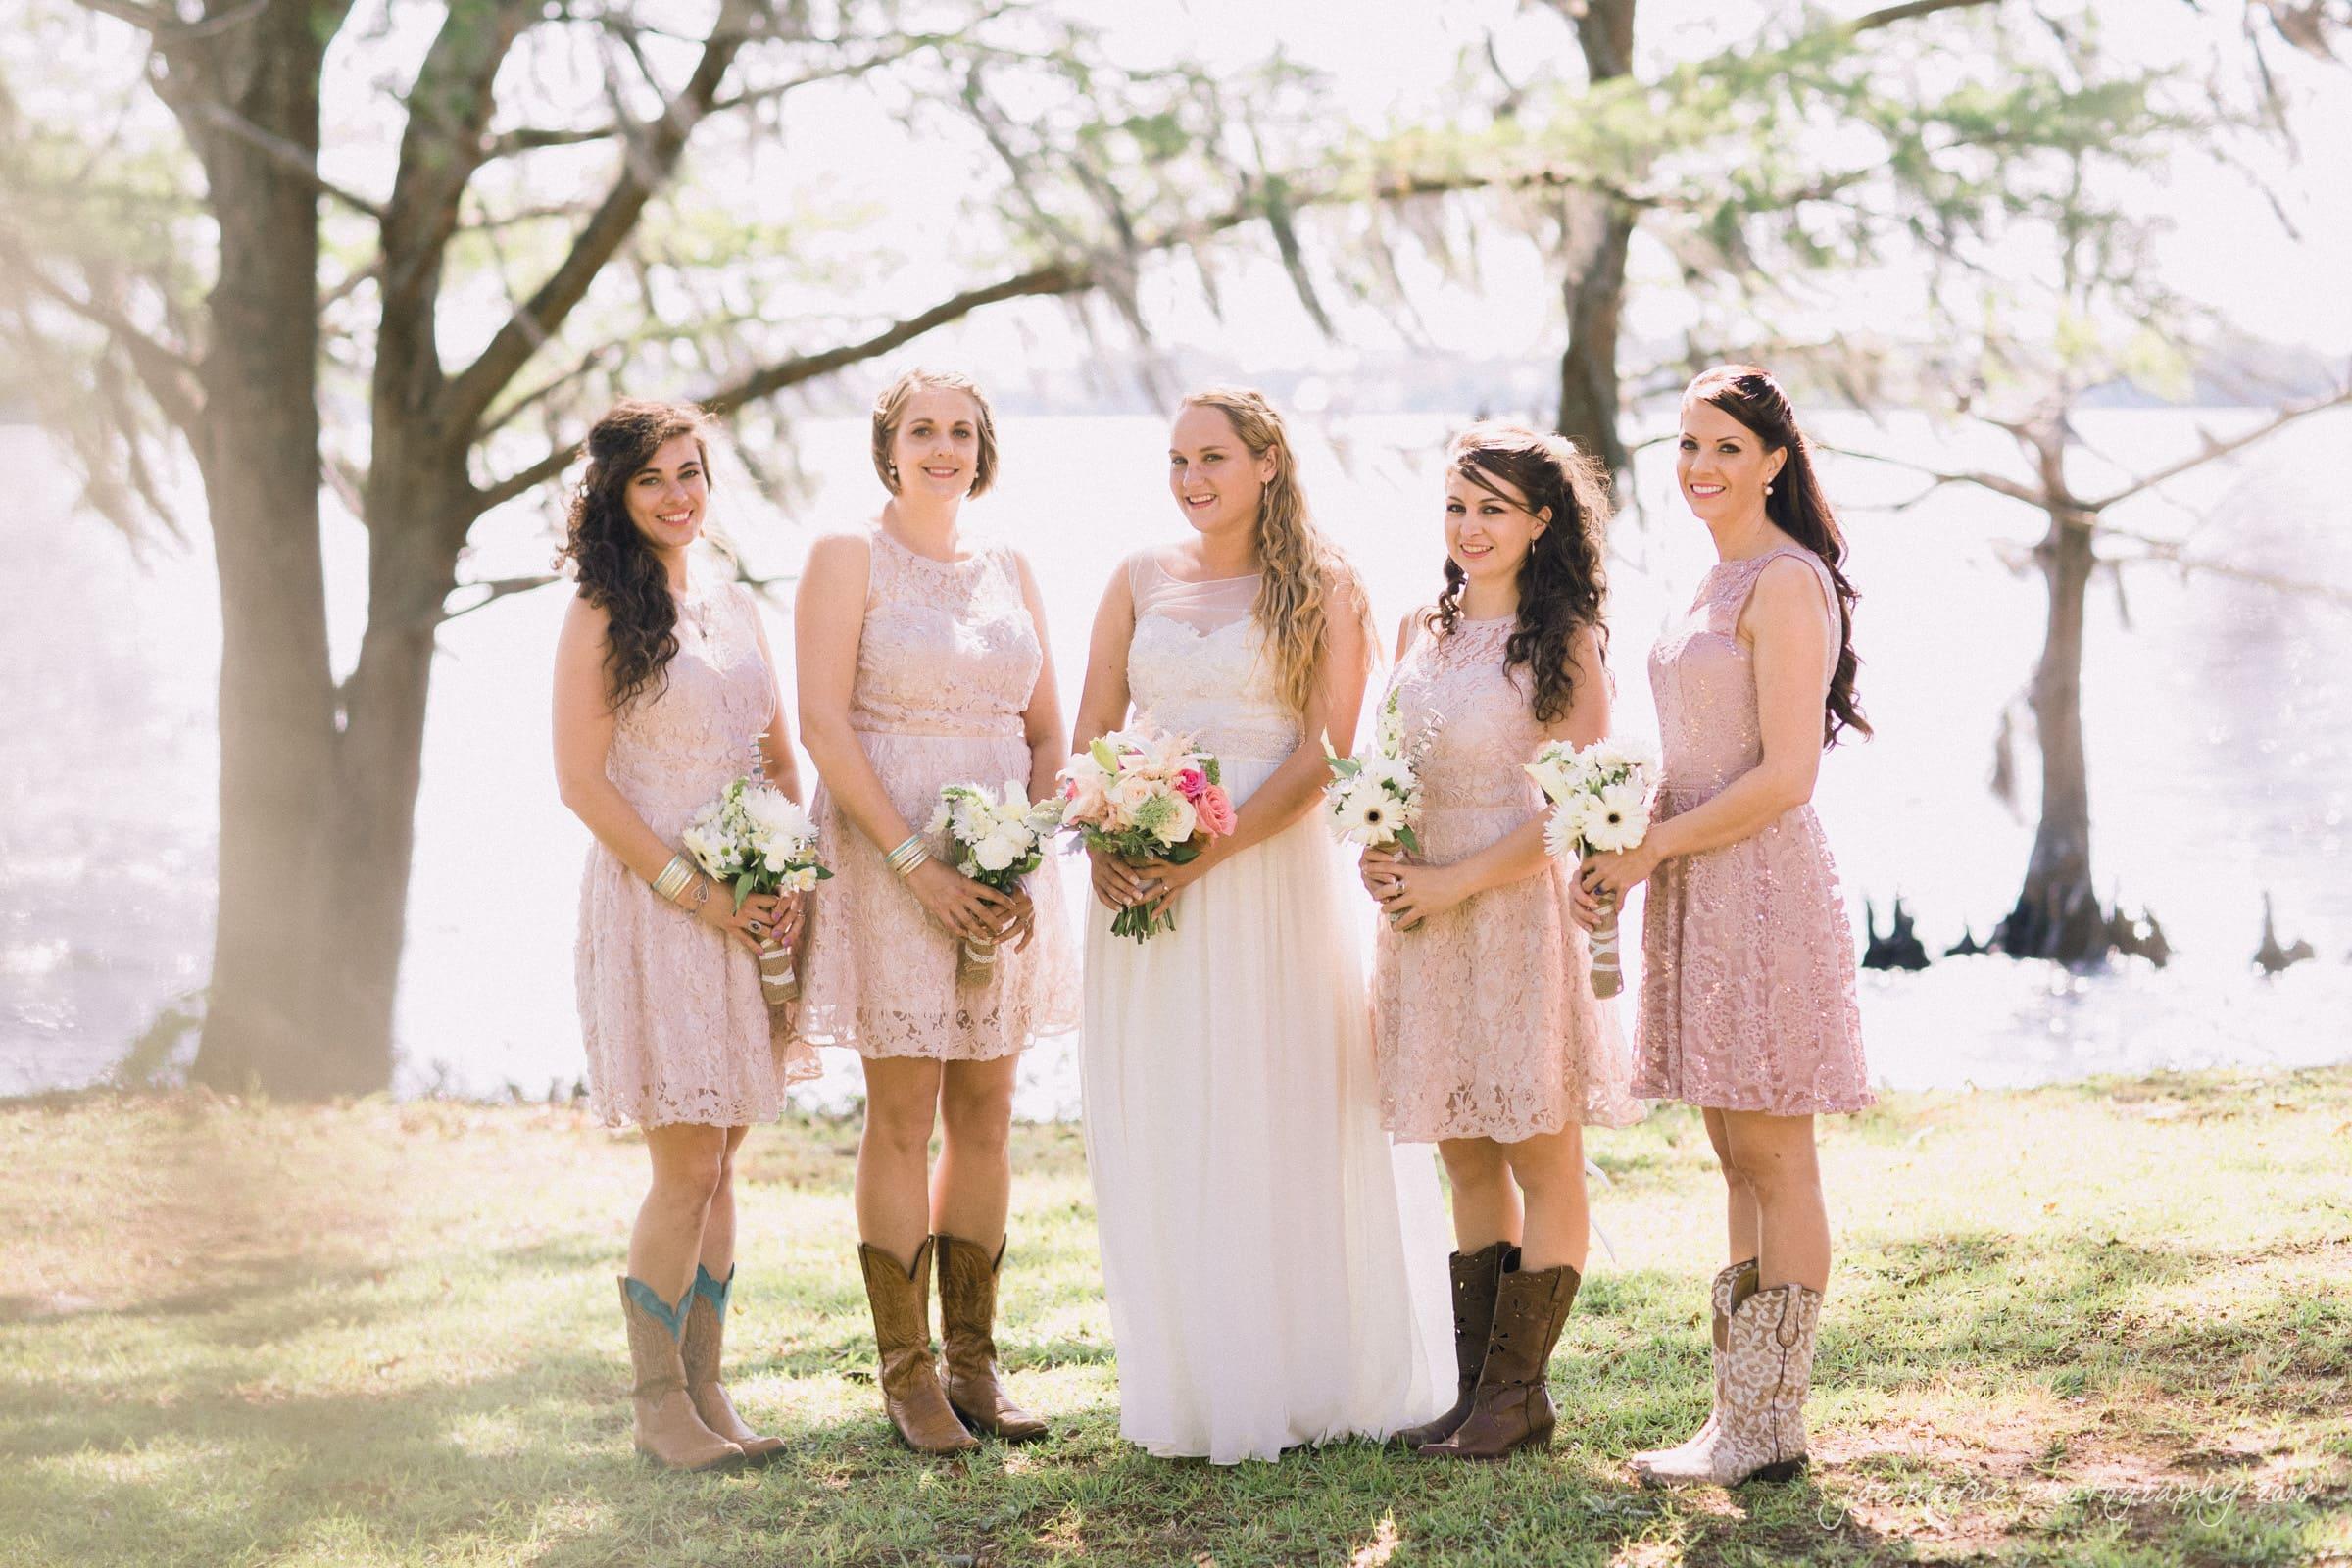 New Bern Wedding Photography - Jessica & Brinson-12